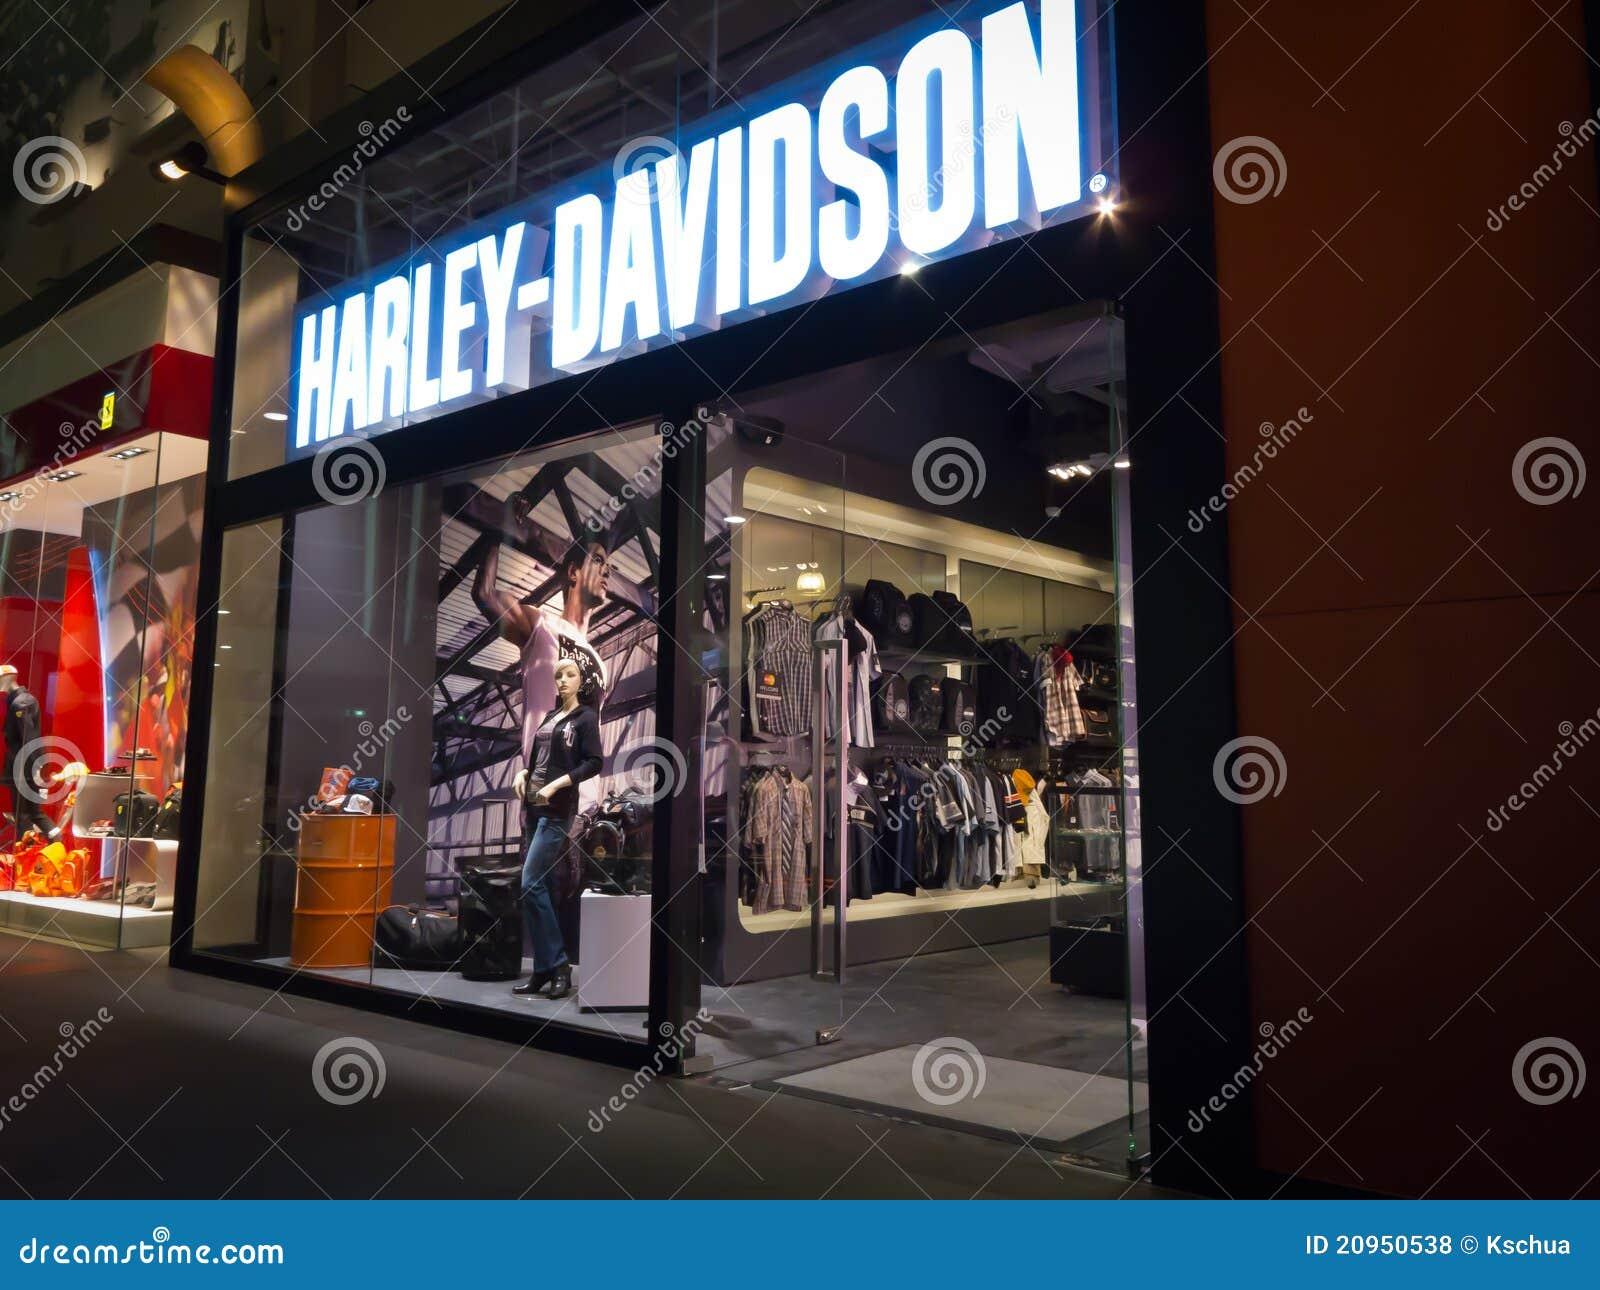 harley davidson store editorial stock photo - image: 20950538